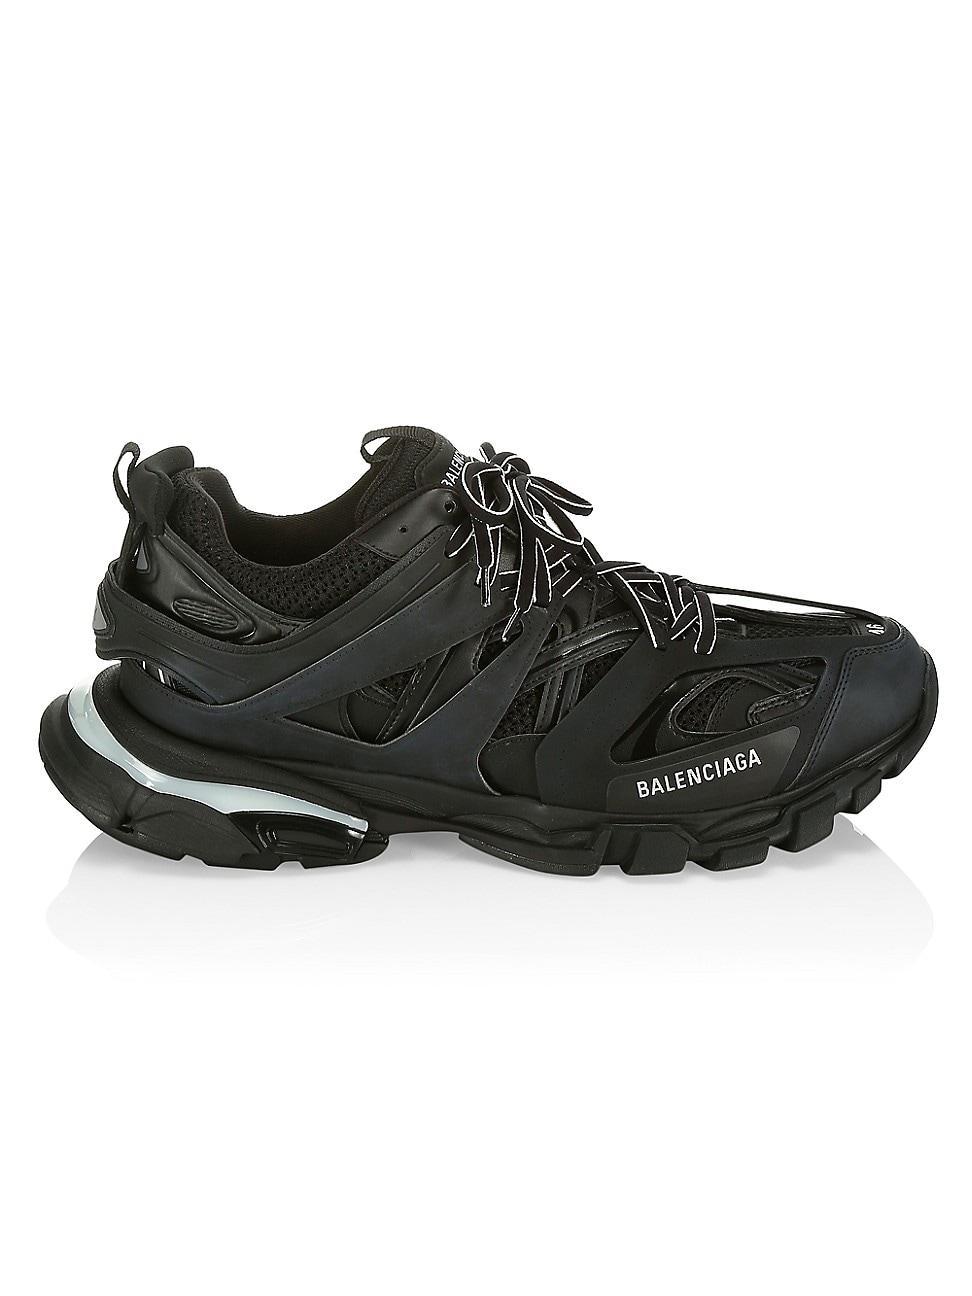 Balenciaga Track Led Sneakers in Black